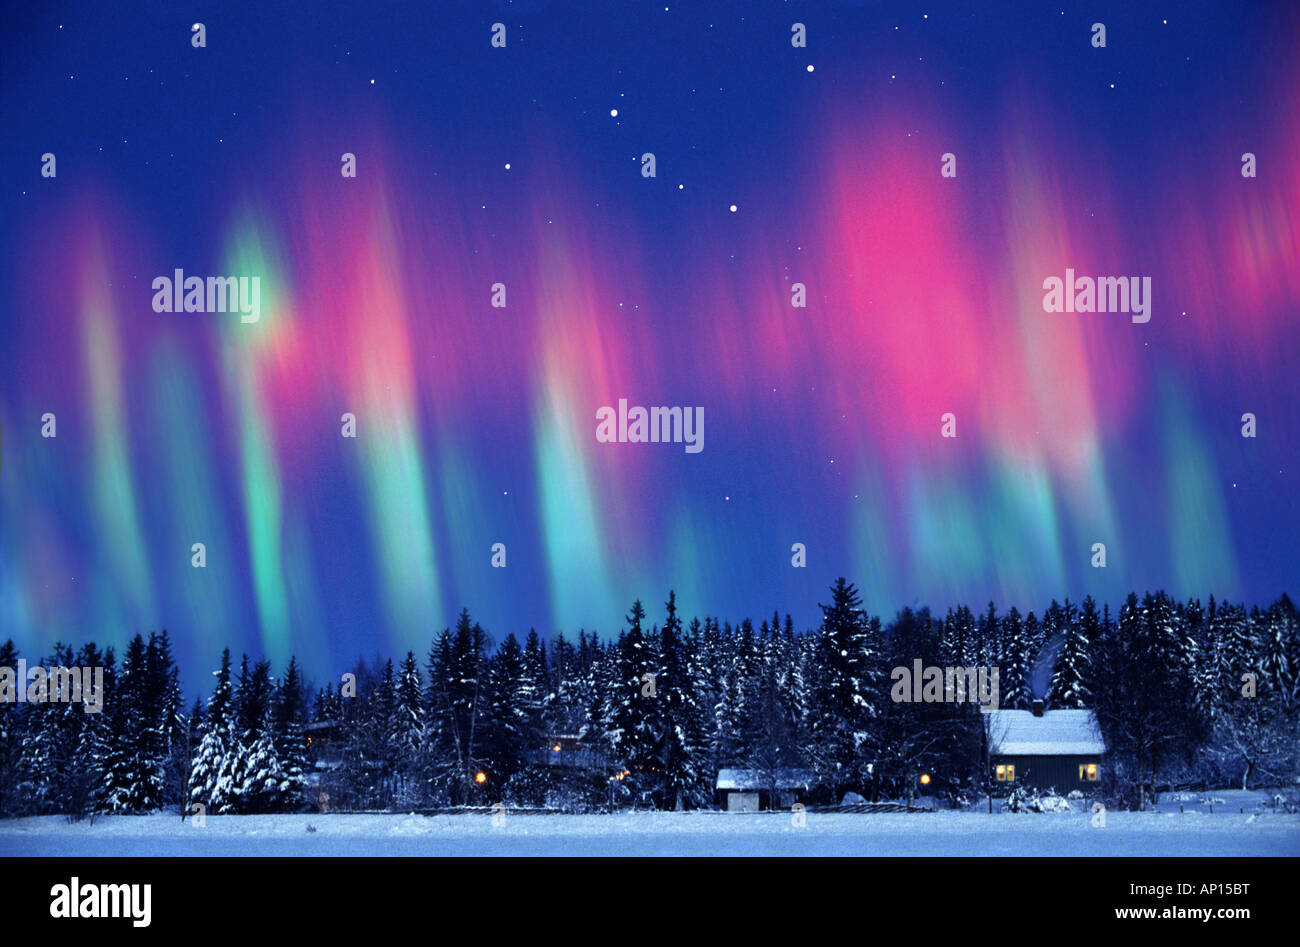 Aurora borealis, Northern Norway, Kautokeino, Lappland, Norway - Stock Image